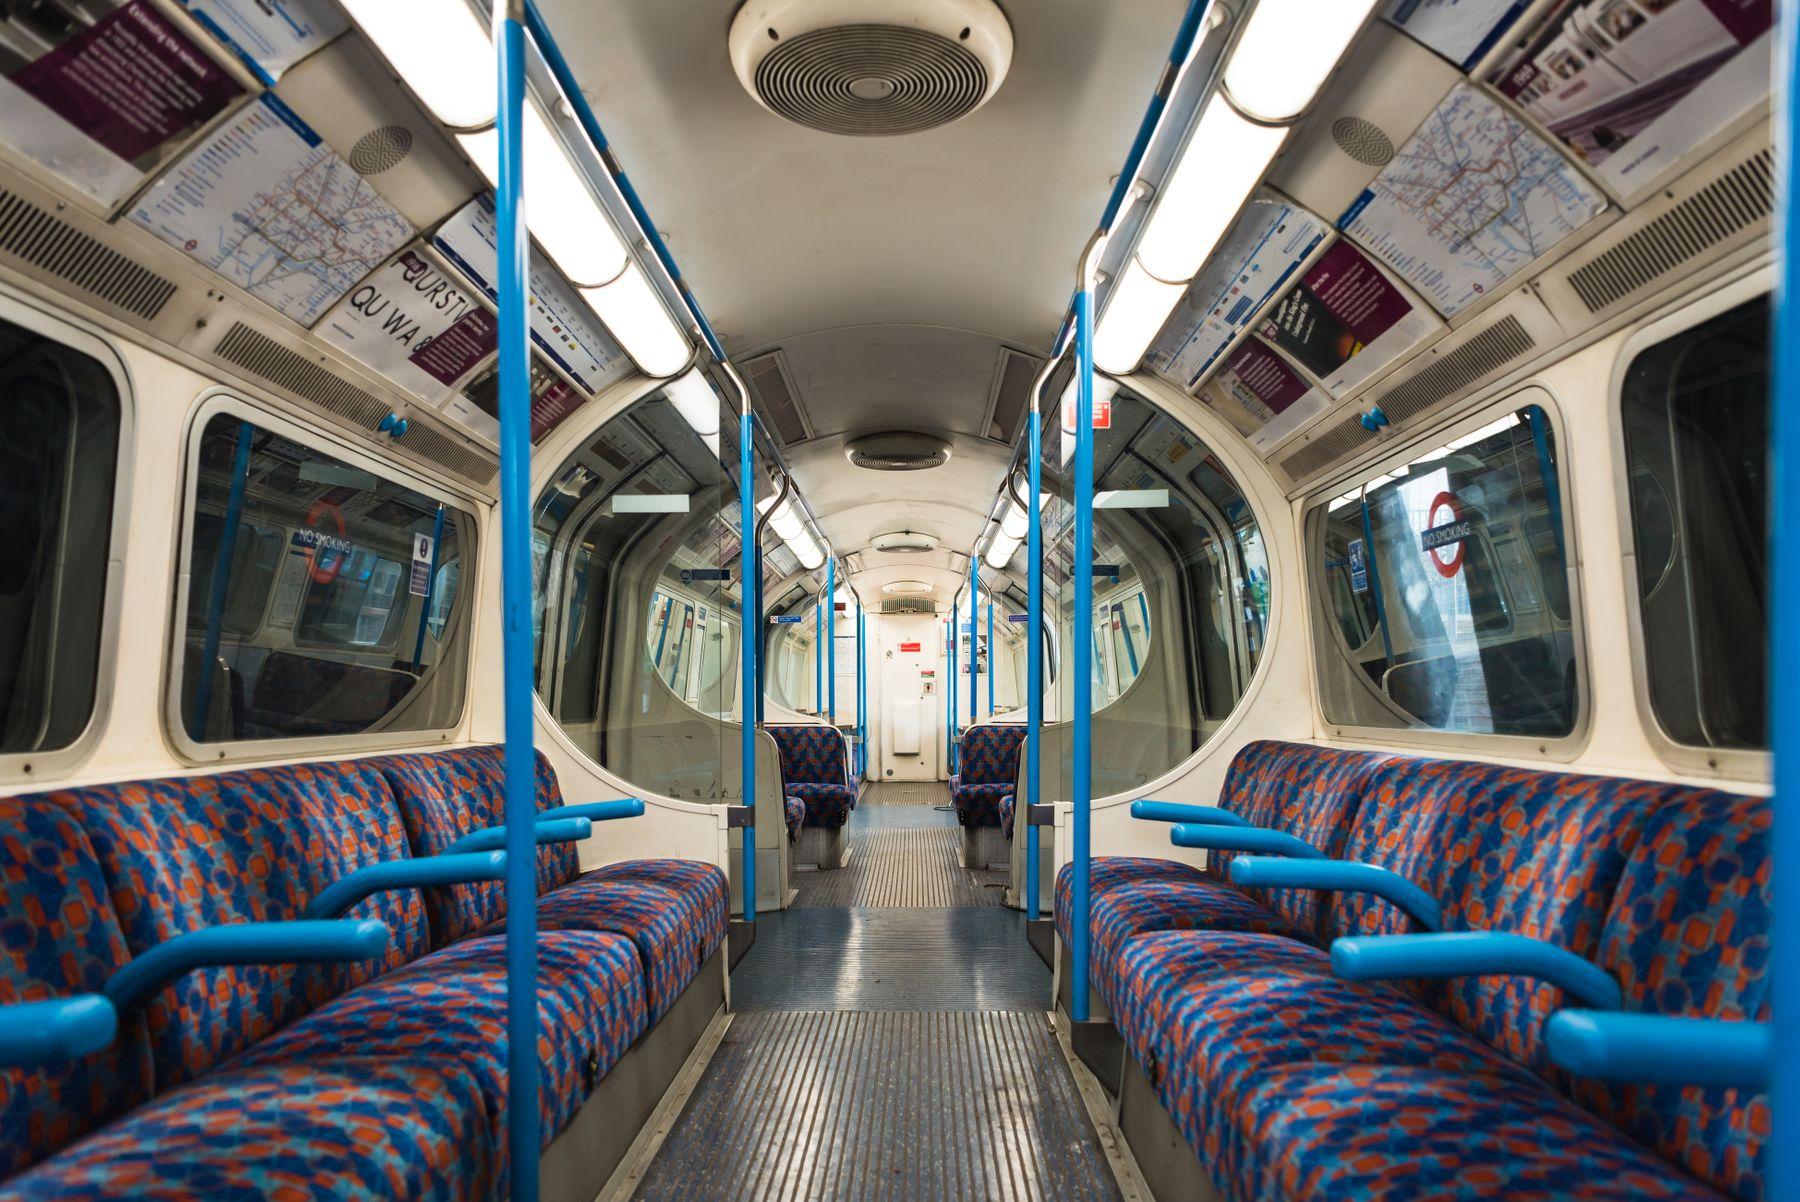 WPHM: Victoria Line Tube Carriage